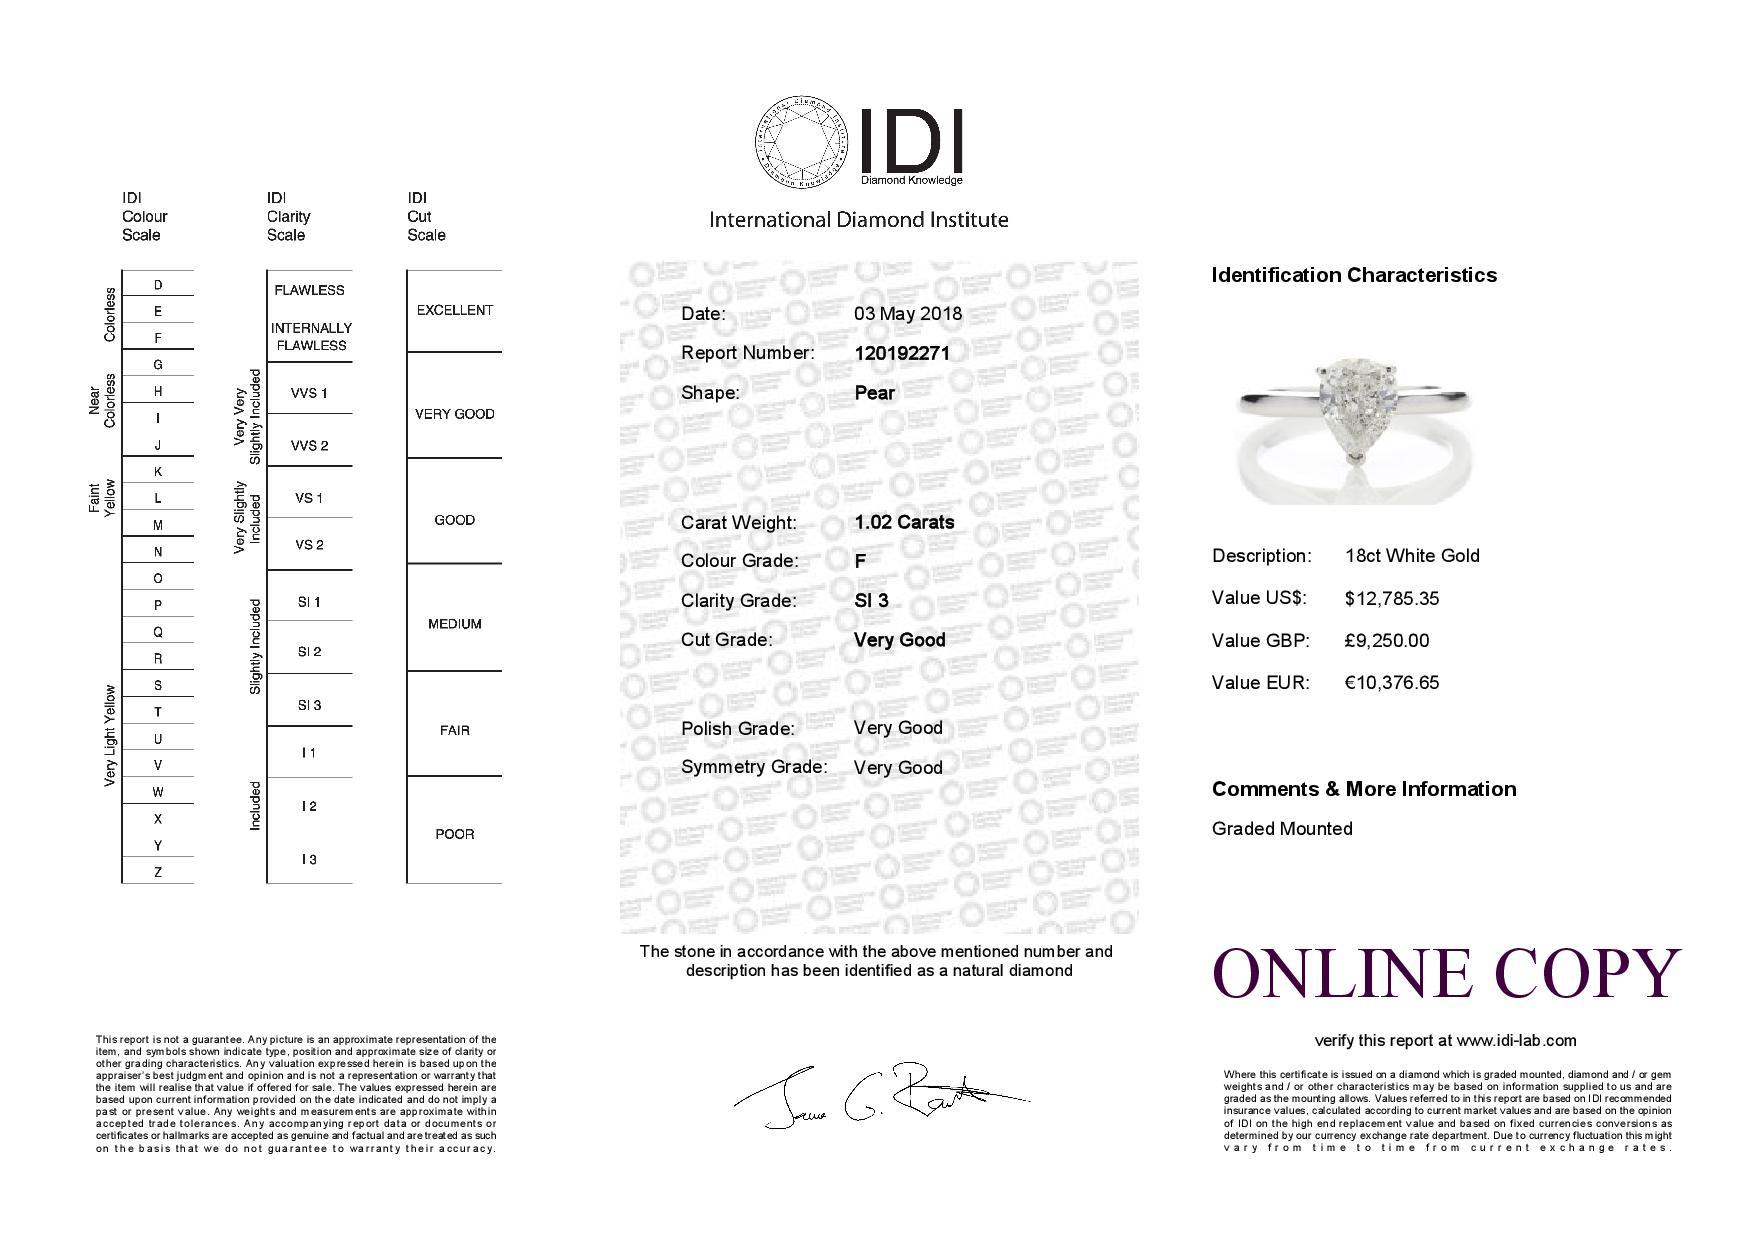 Lot 27 - 18ct White Gold Pear Cut Diamond Ring 1.02 Carats